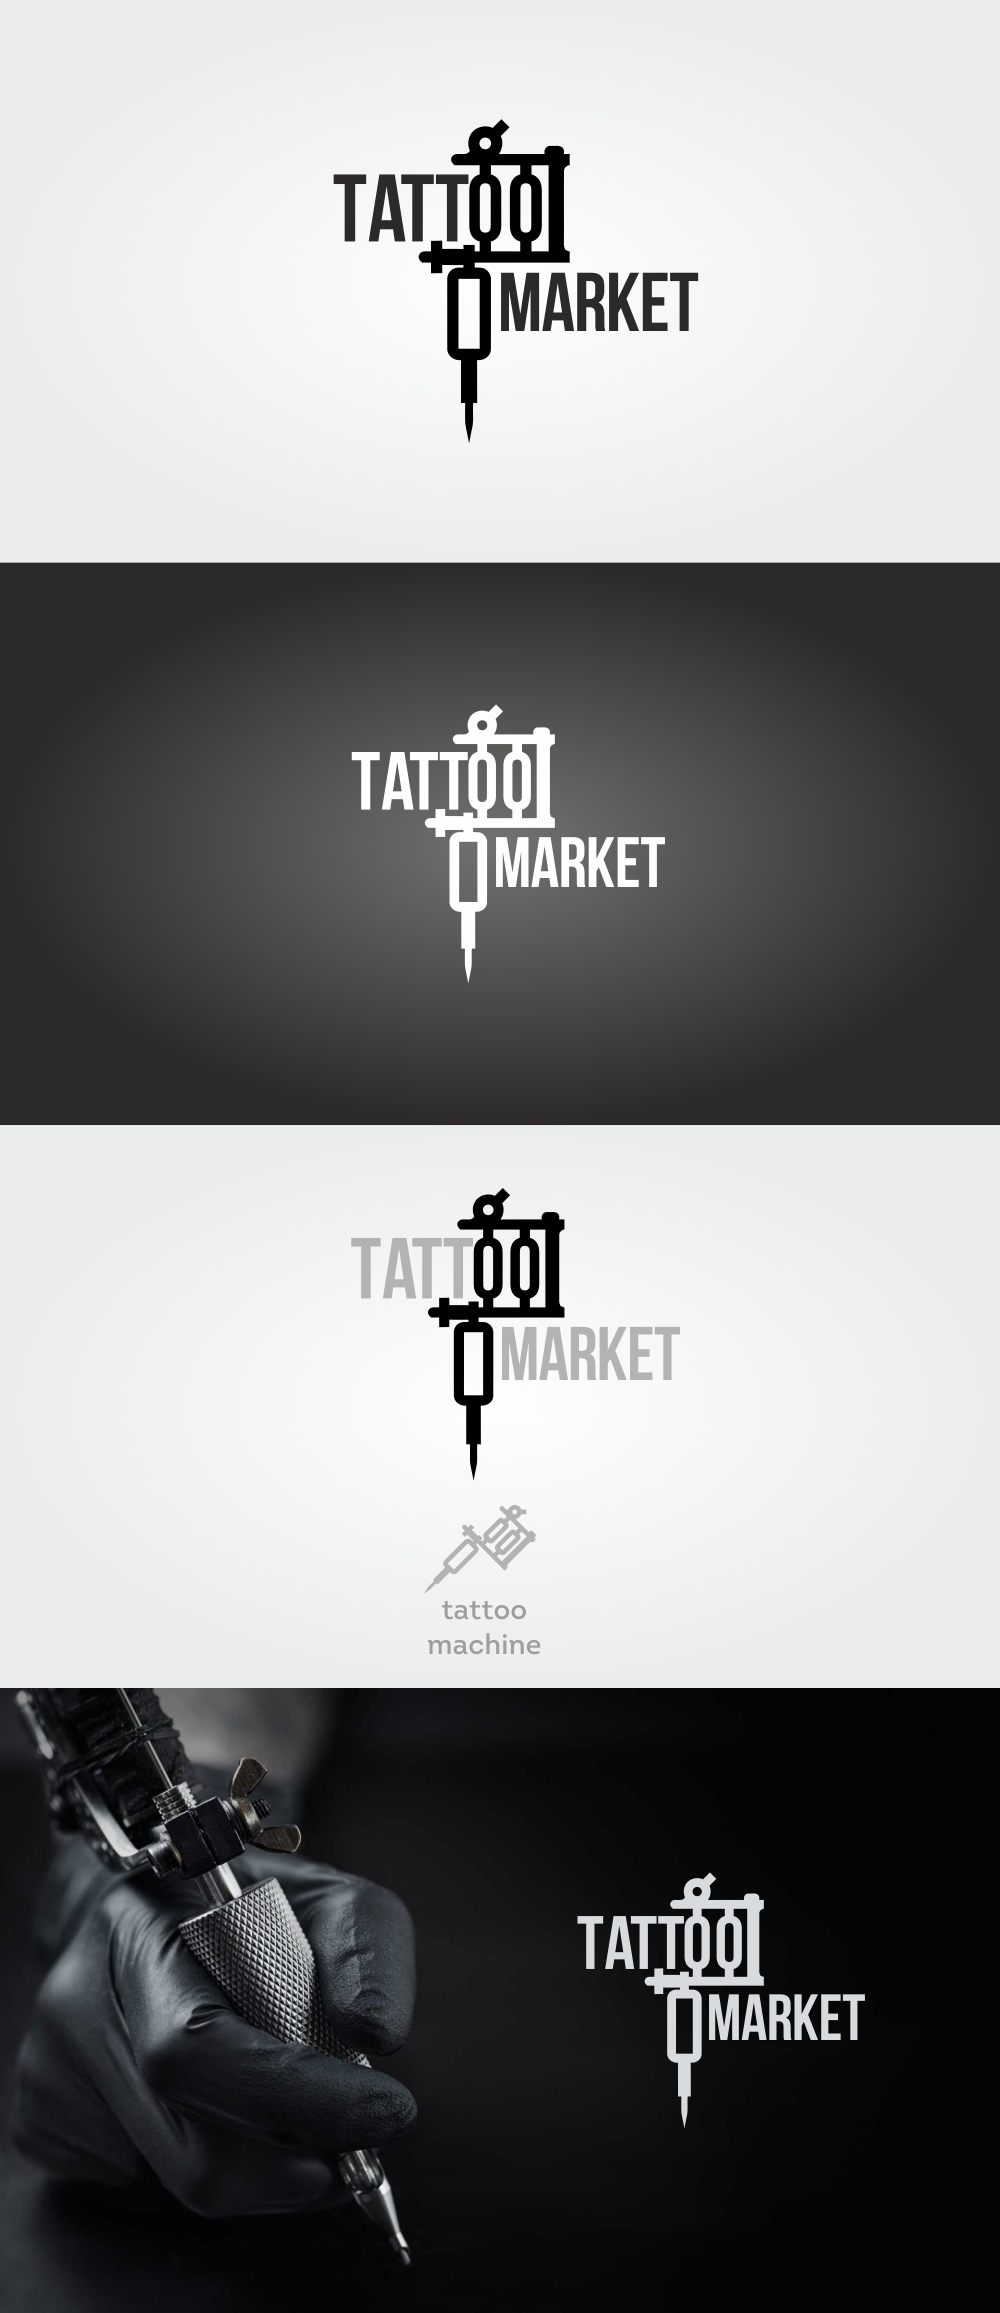 Редизайн логотипа магазина тату оборудования TattooMarket.ru фото f_3575c3c7802d8474.jpg